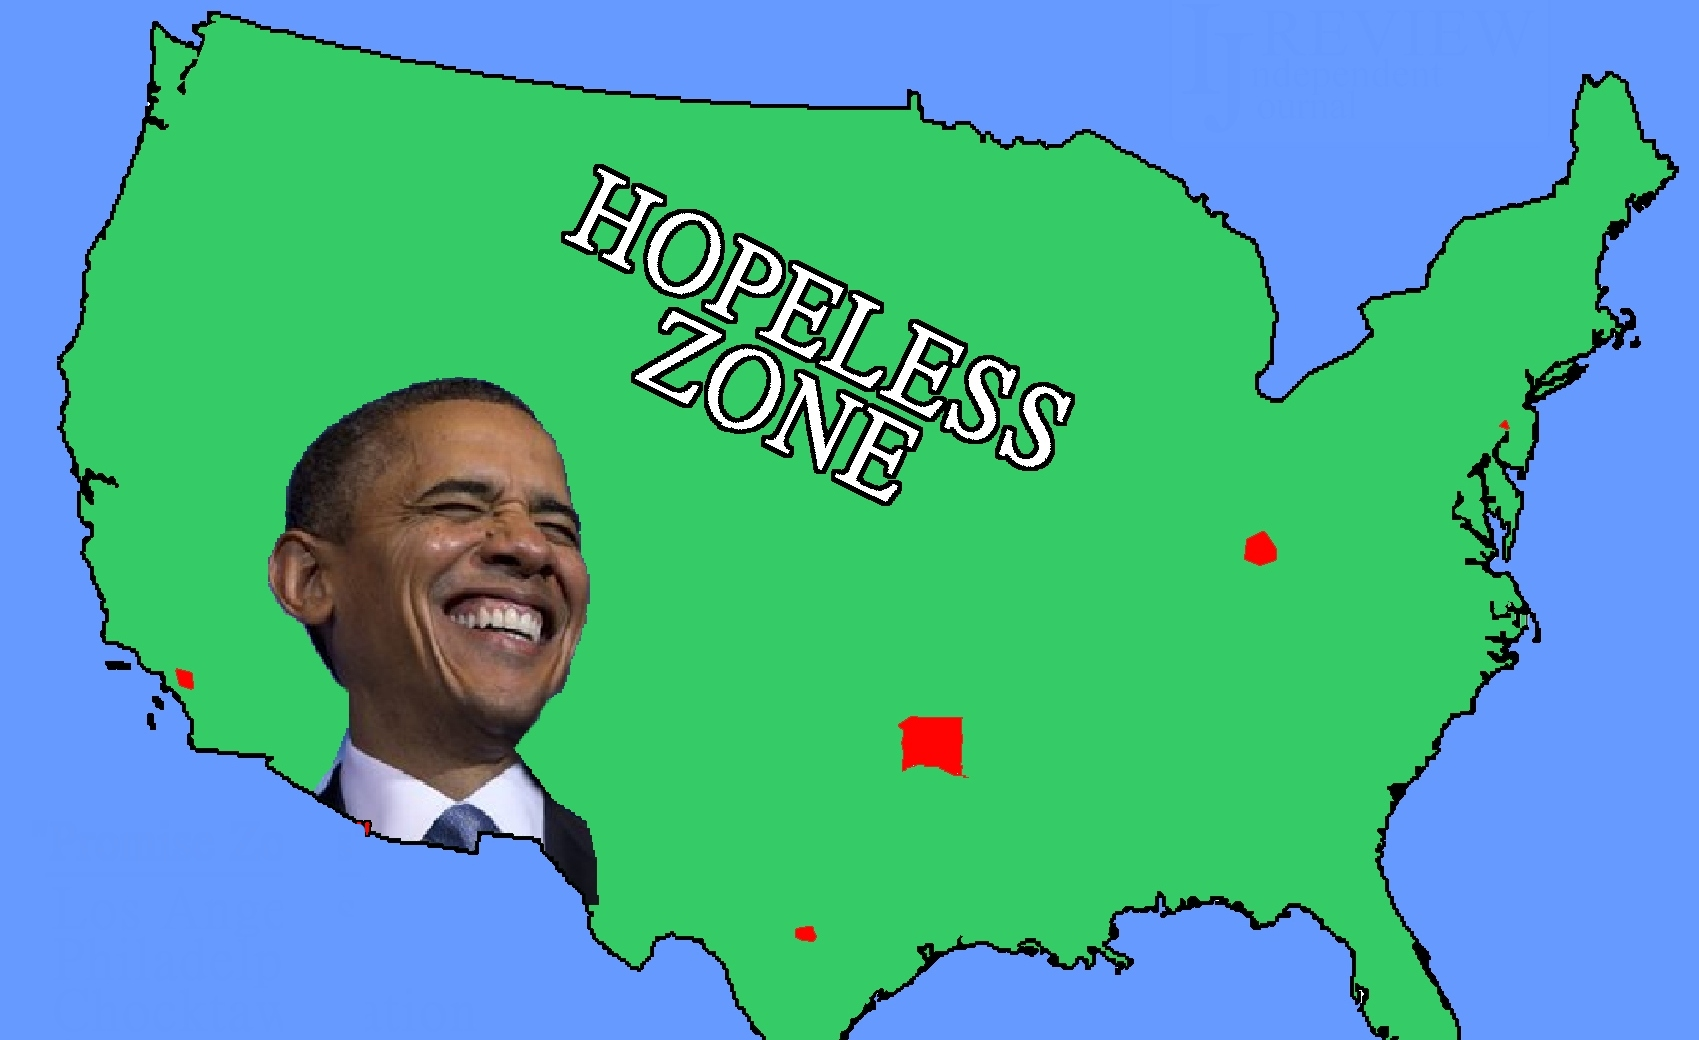 America-OBAMA-HOPE-ZONES1